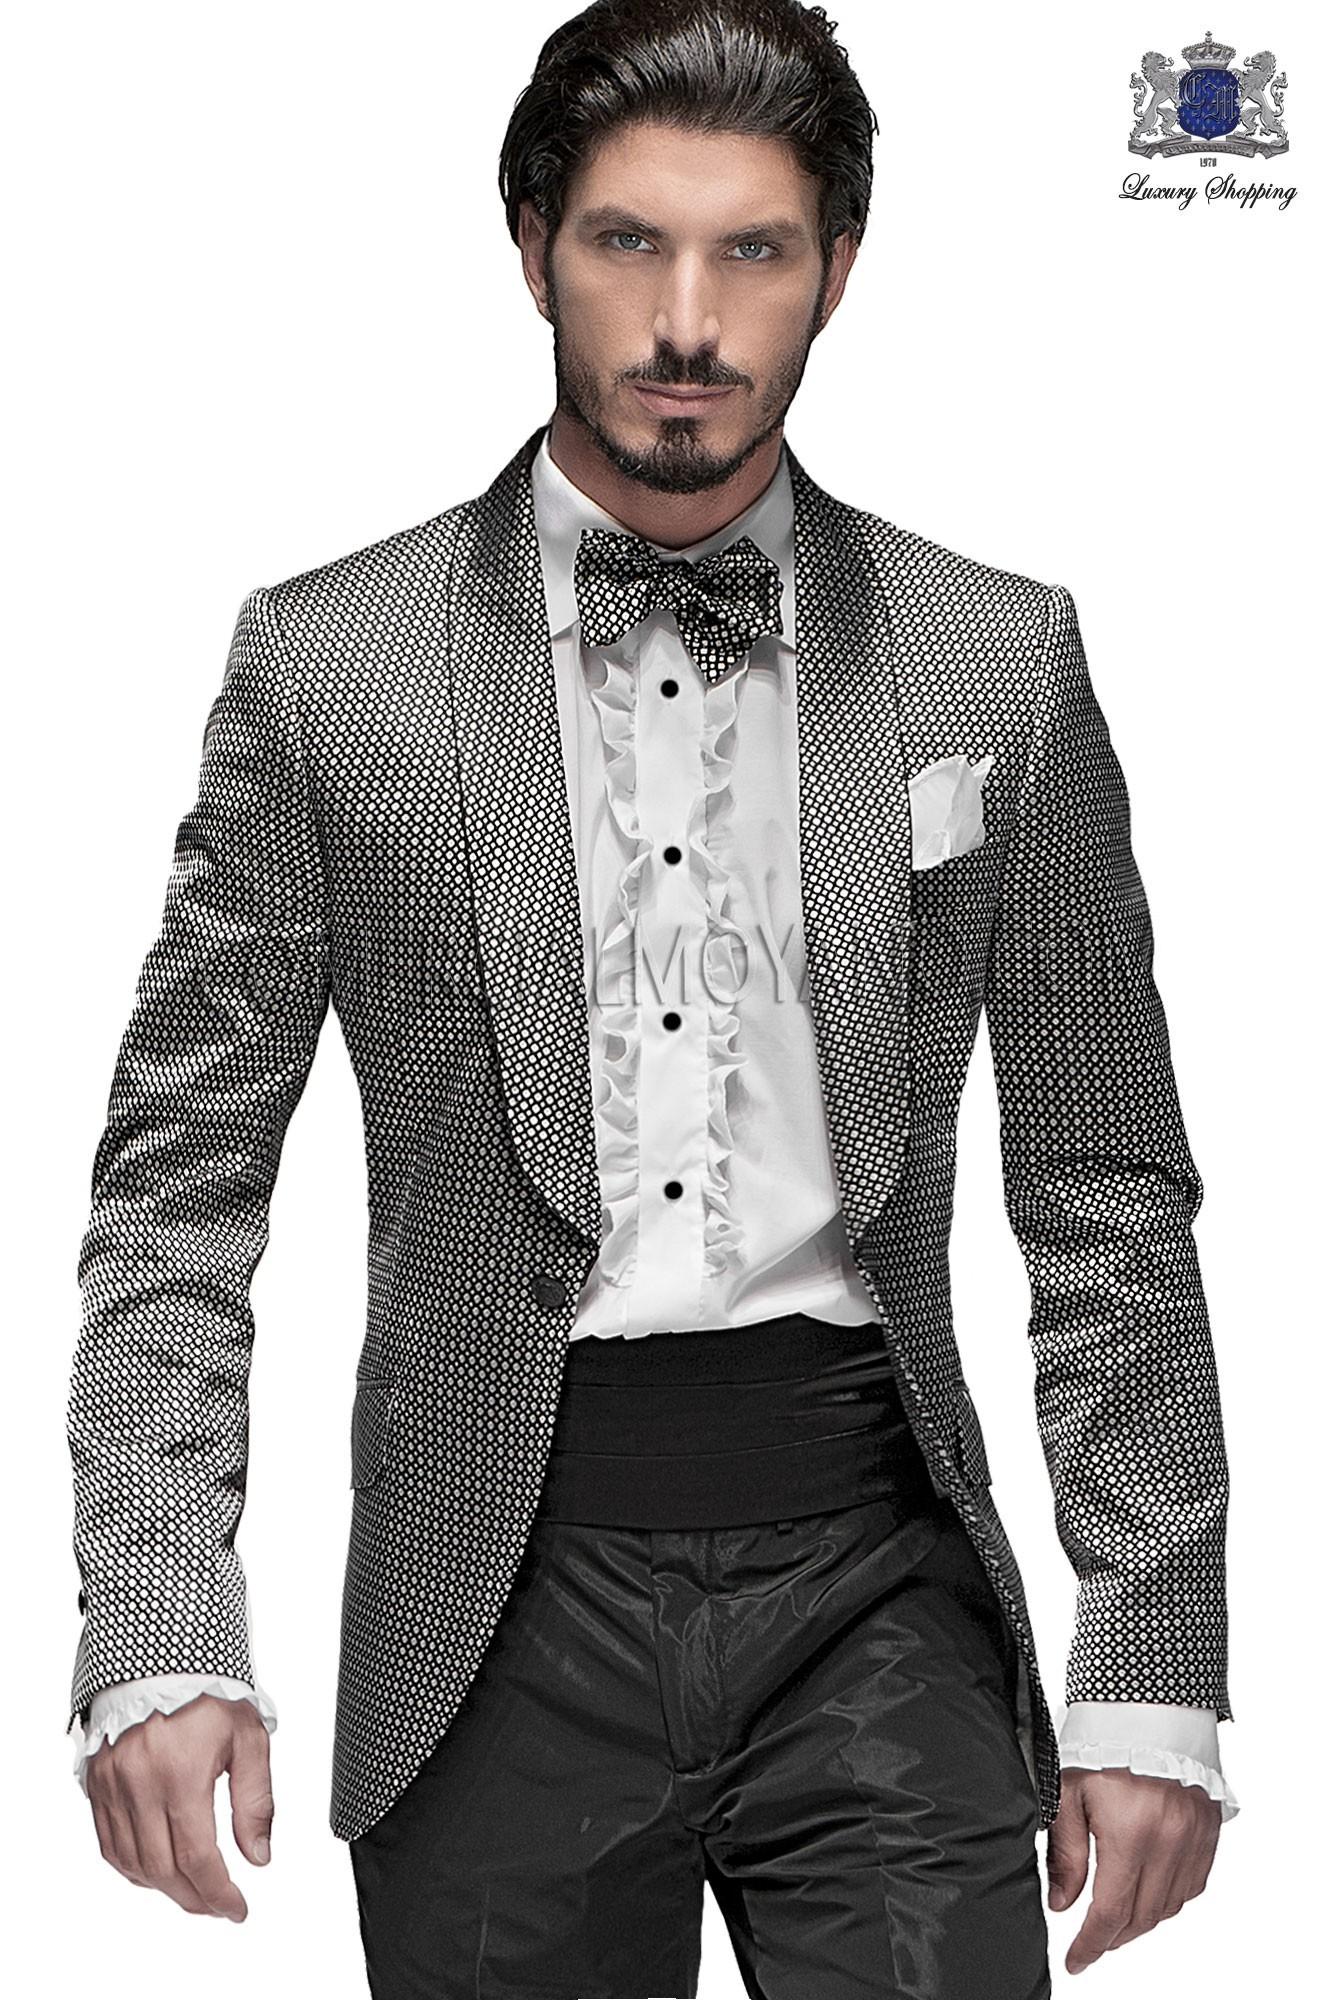 Emotion silver/ black men wedding suit model 60963 Ottavio Nuccio Gala